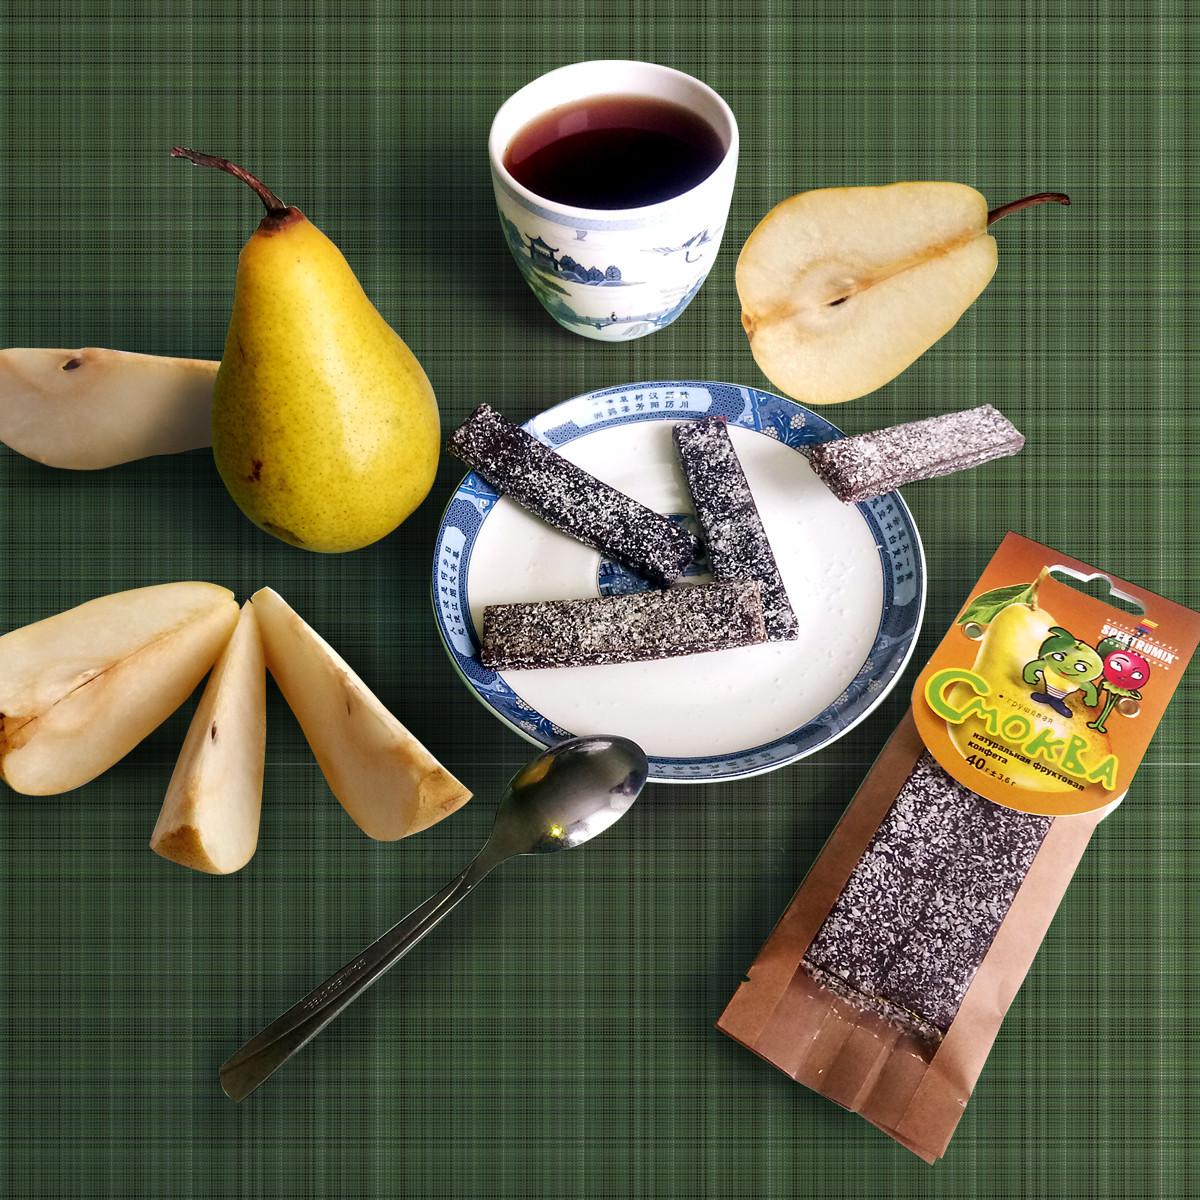 Натуральная фруктовая конфета «Смоква грушевая», 40 г